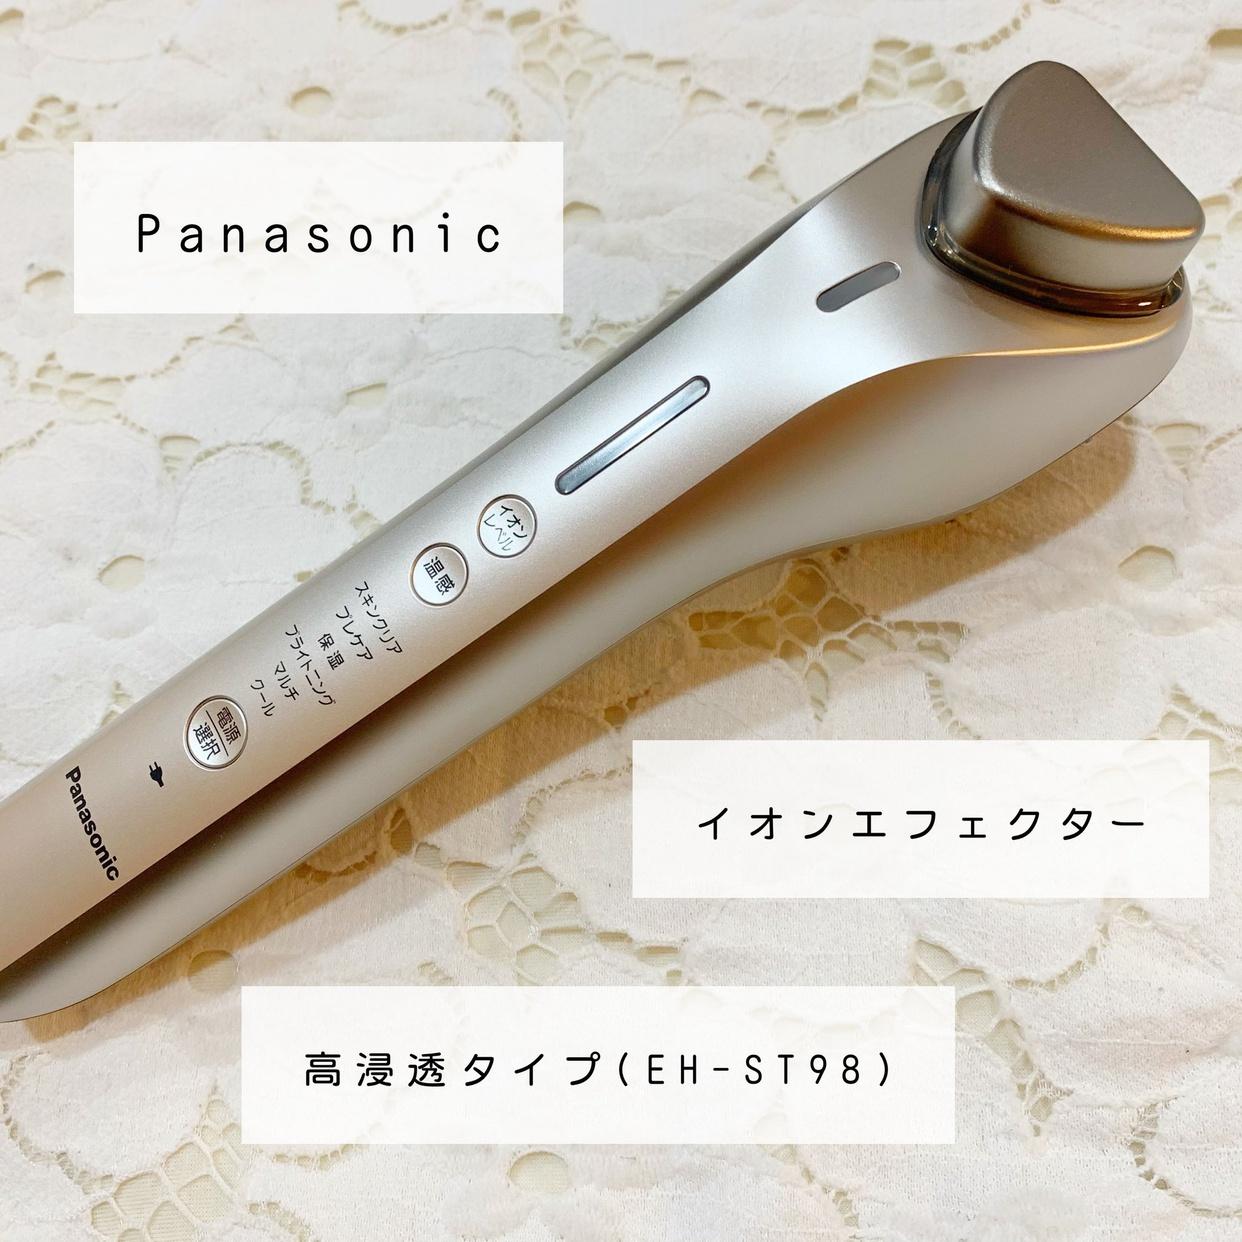 Panasonic(パナソニック) イオンエフェクター EH-ST98-Nを使ったKeiさんのクチコミ画像1